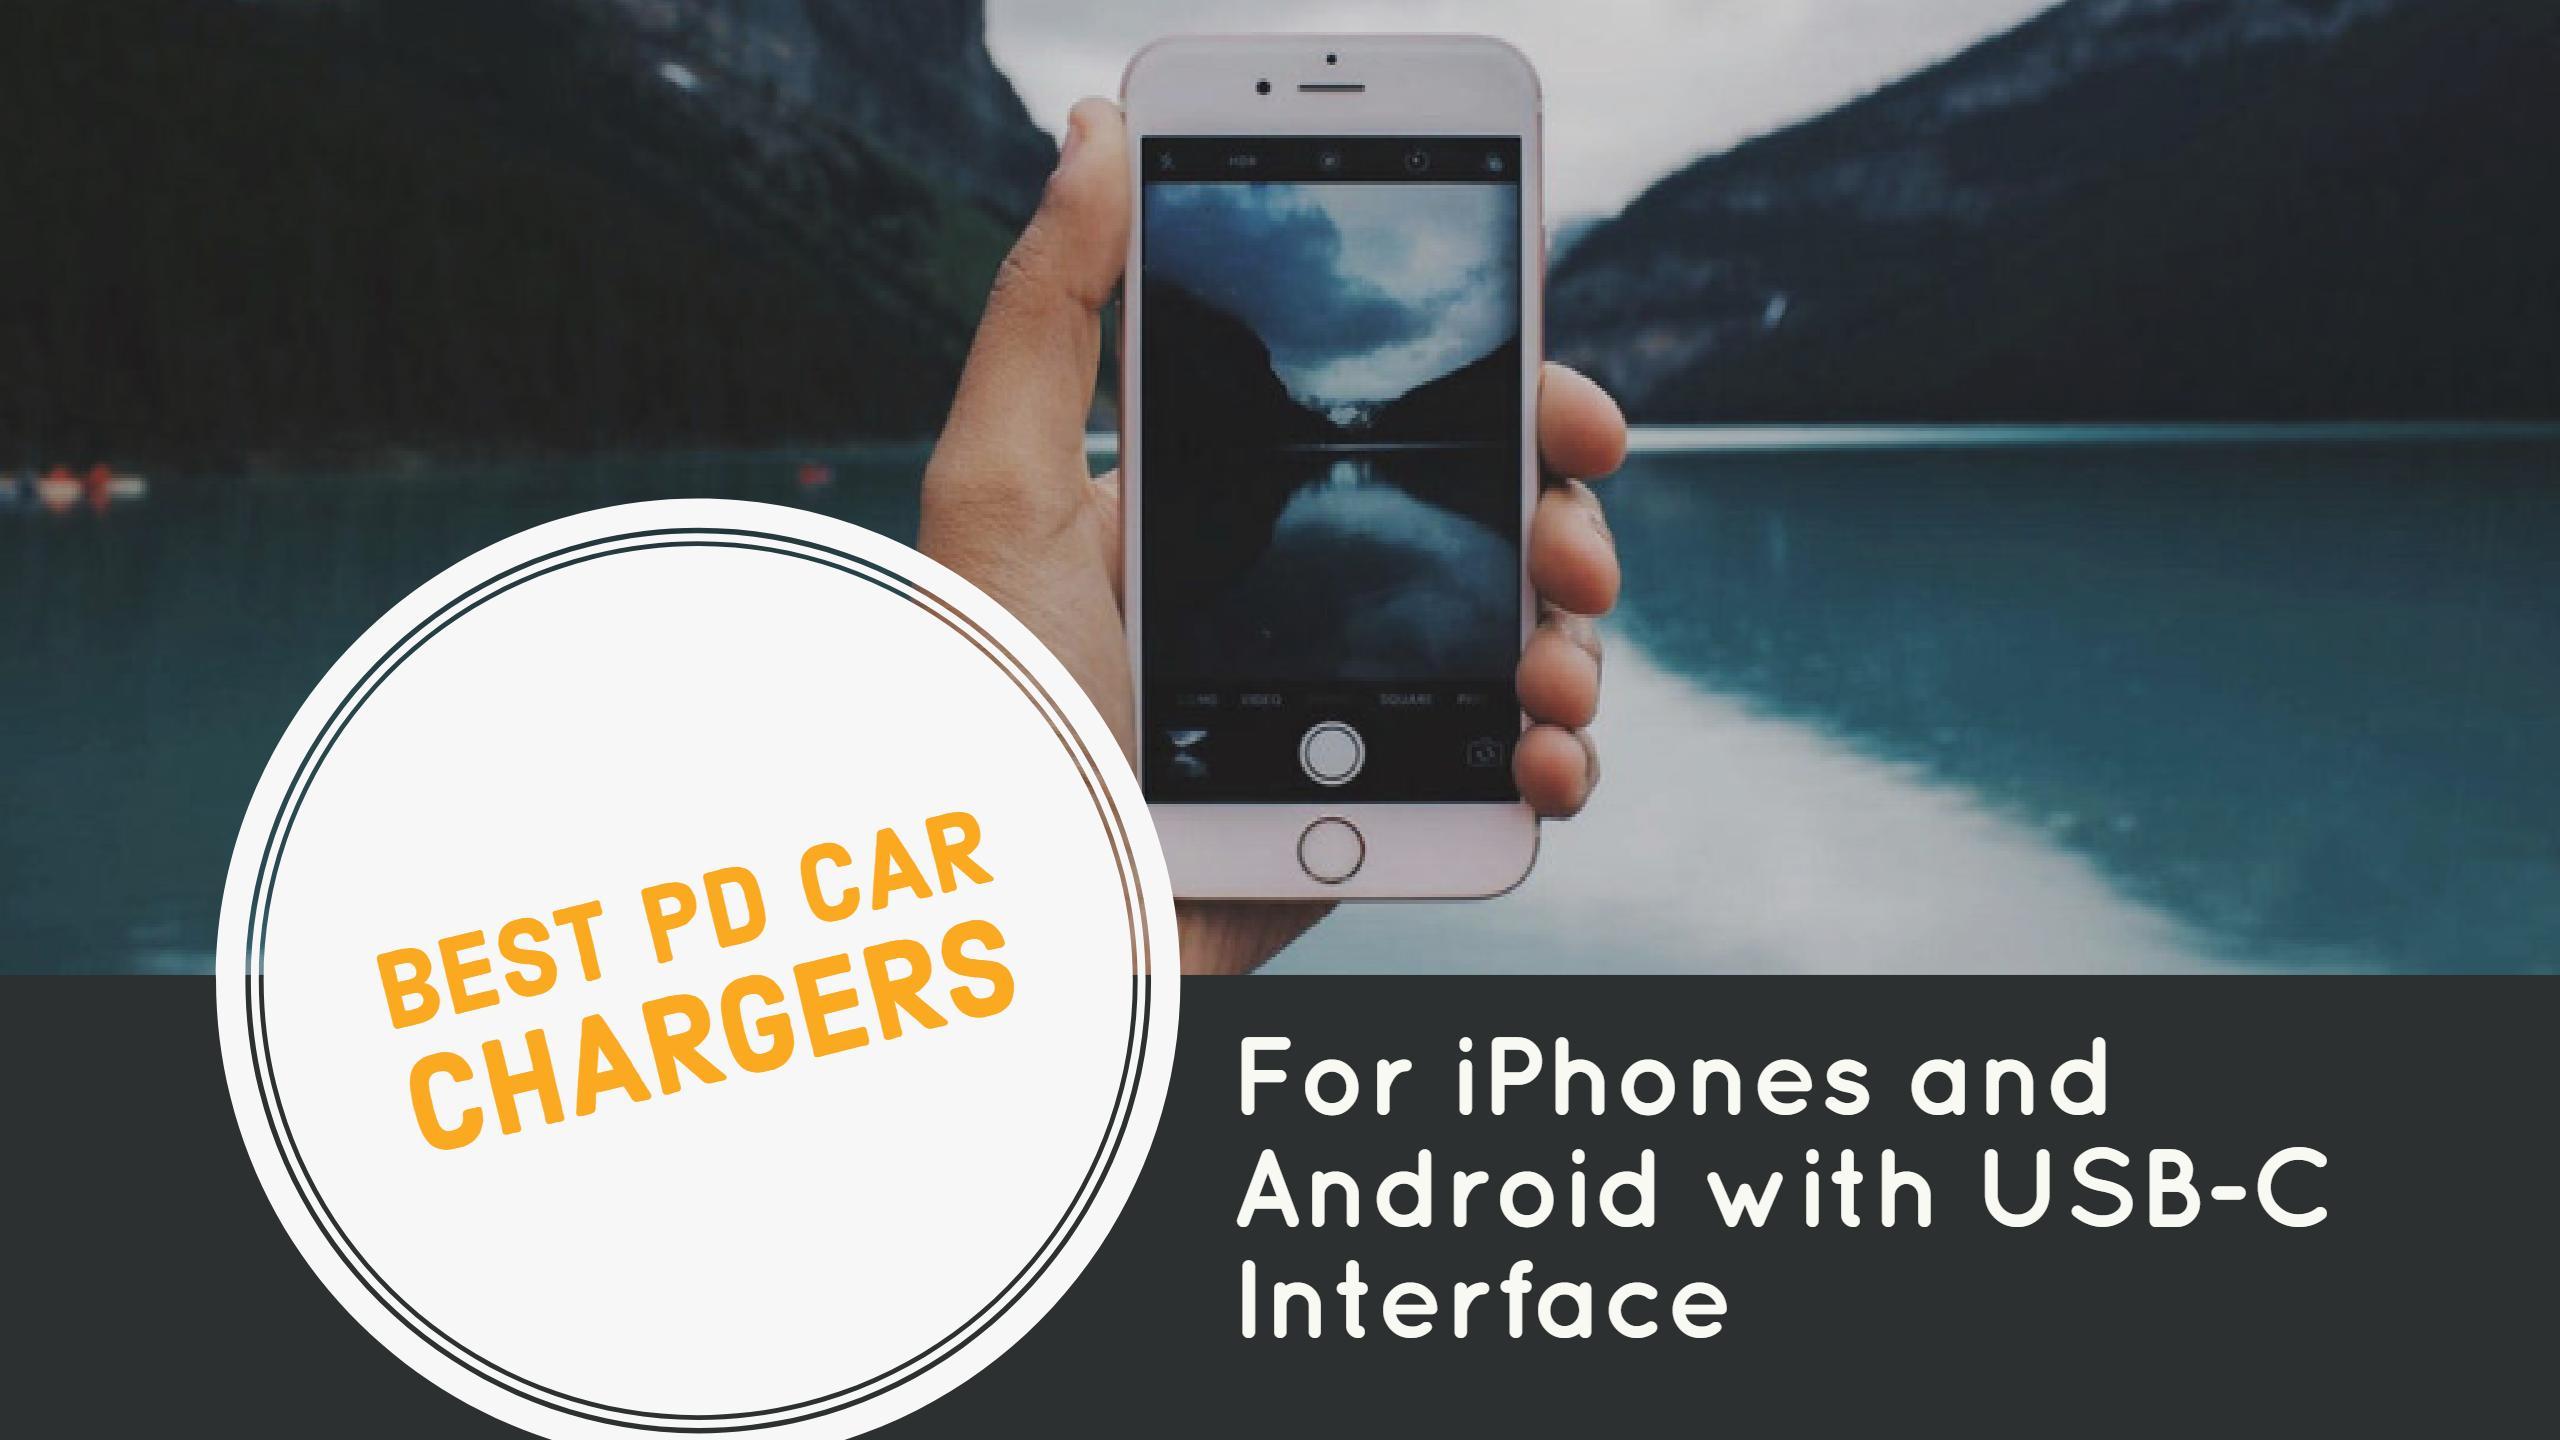 Best USB C PD Car Chargers